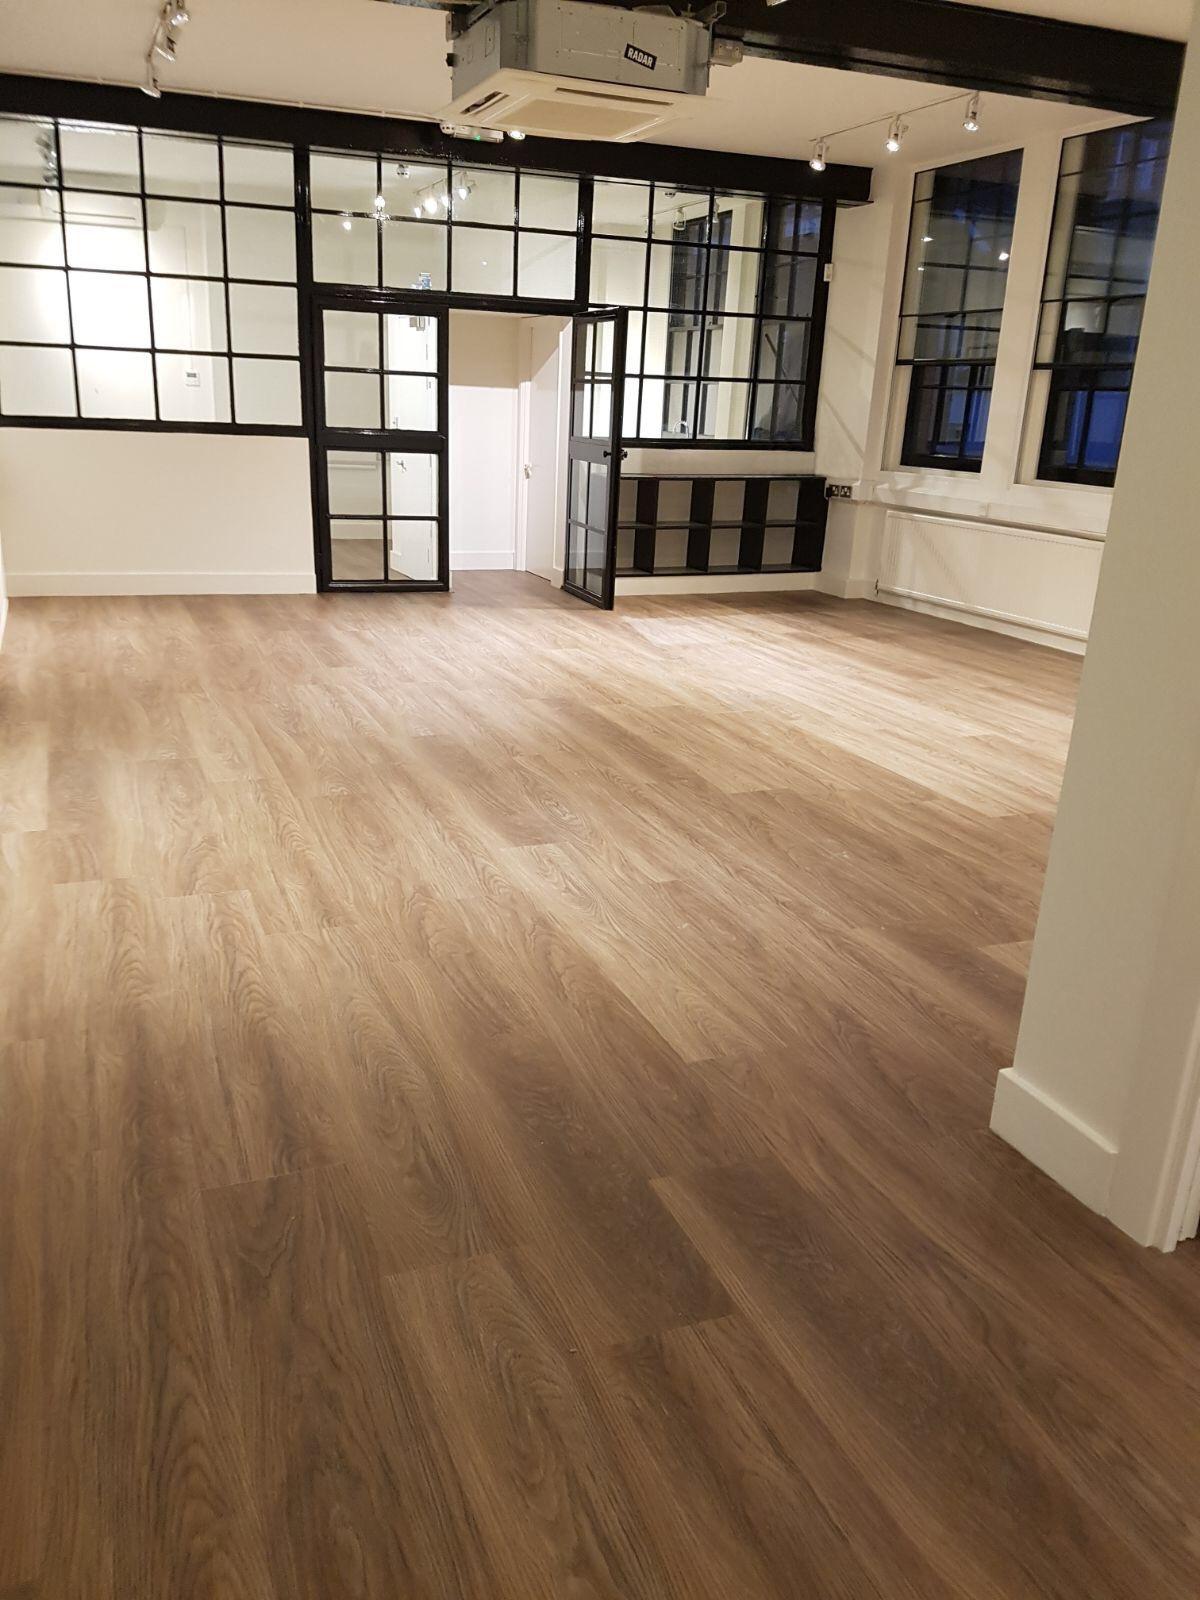 youtube your flooring stick peel down floor floors vinyl and installing watch tile